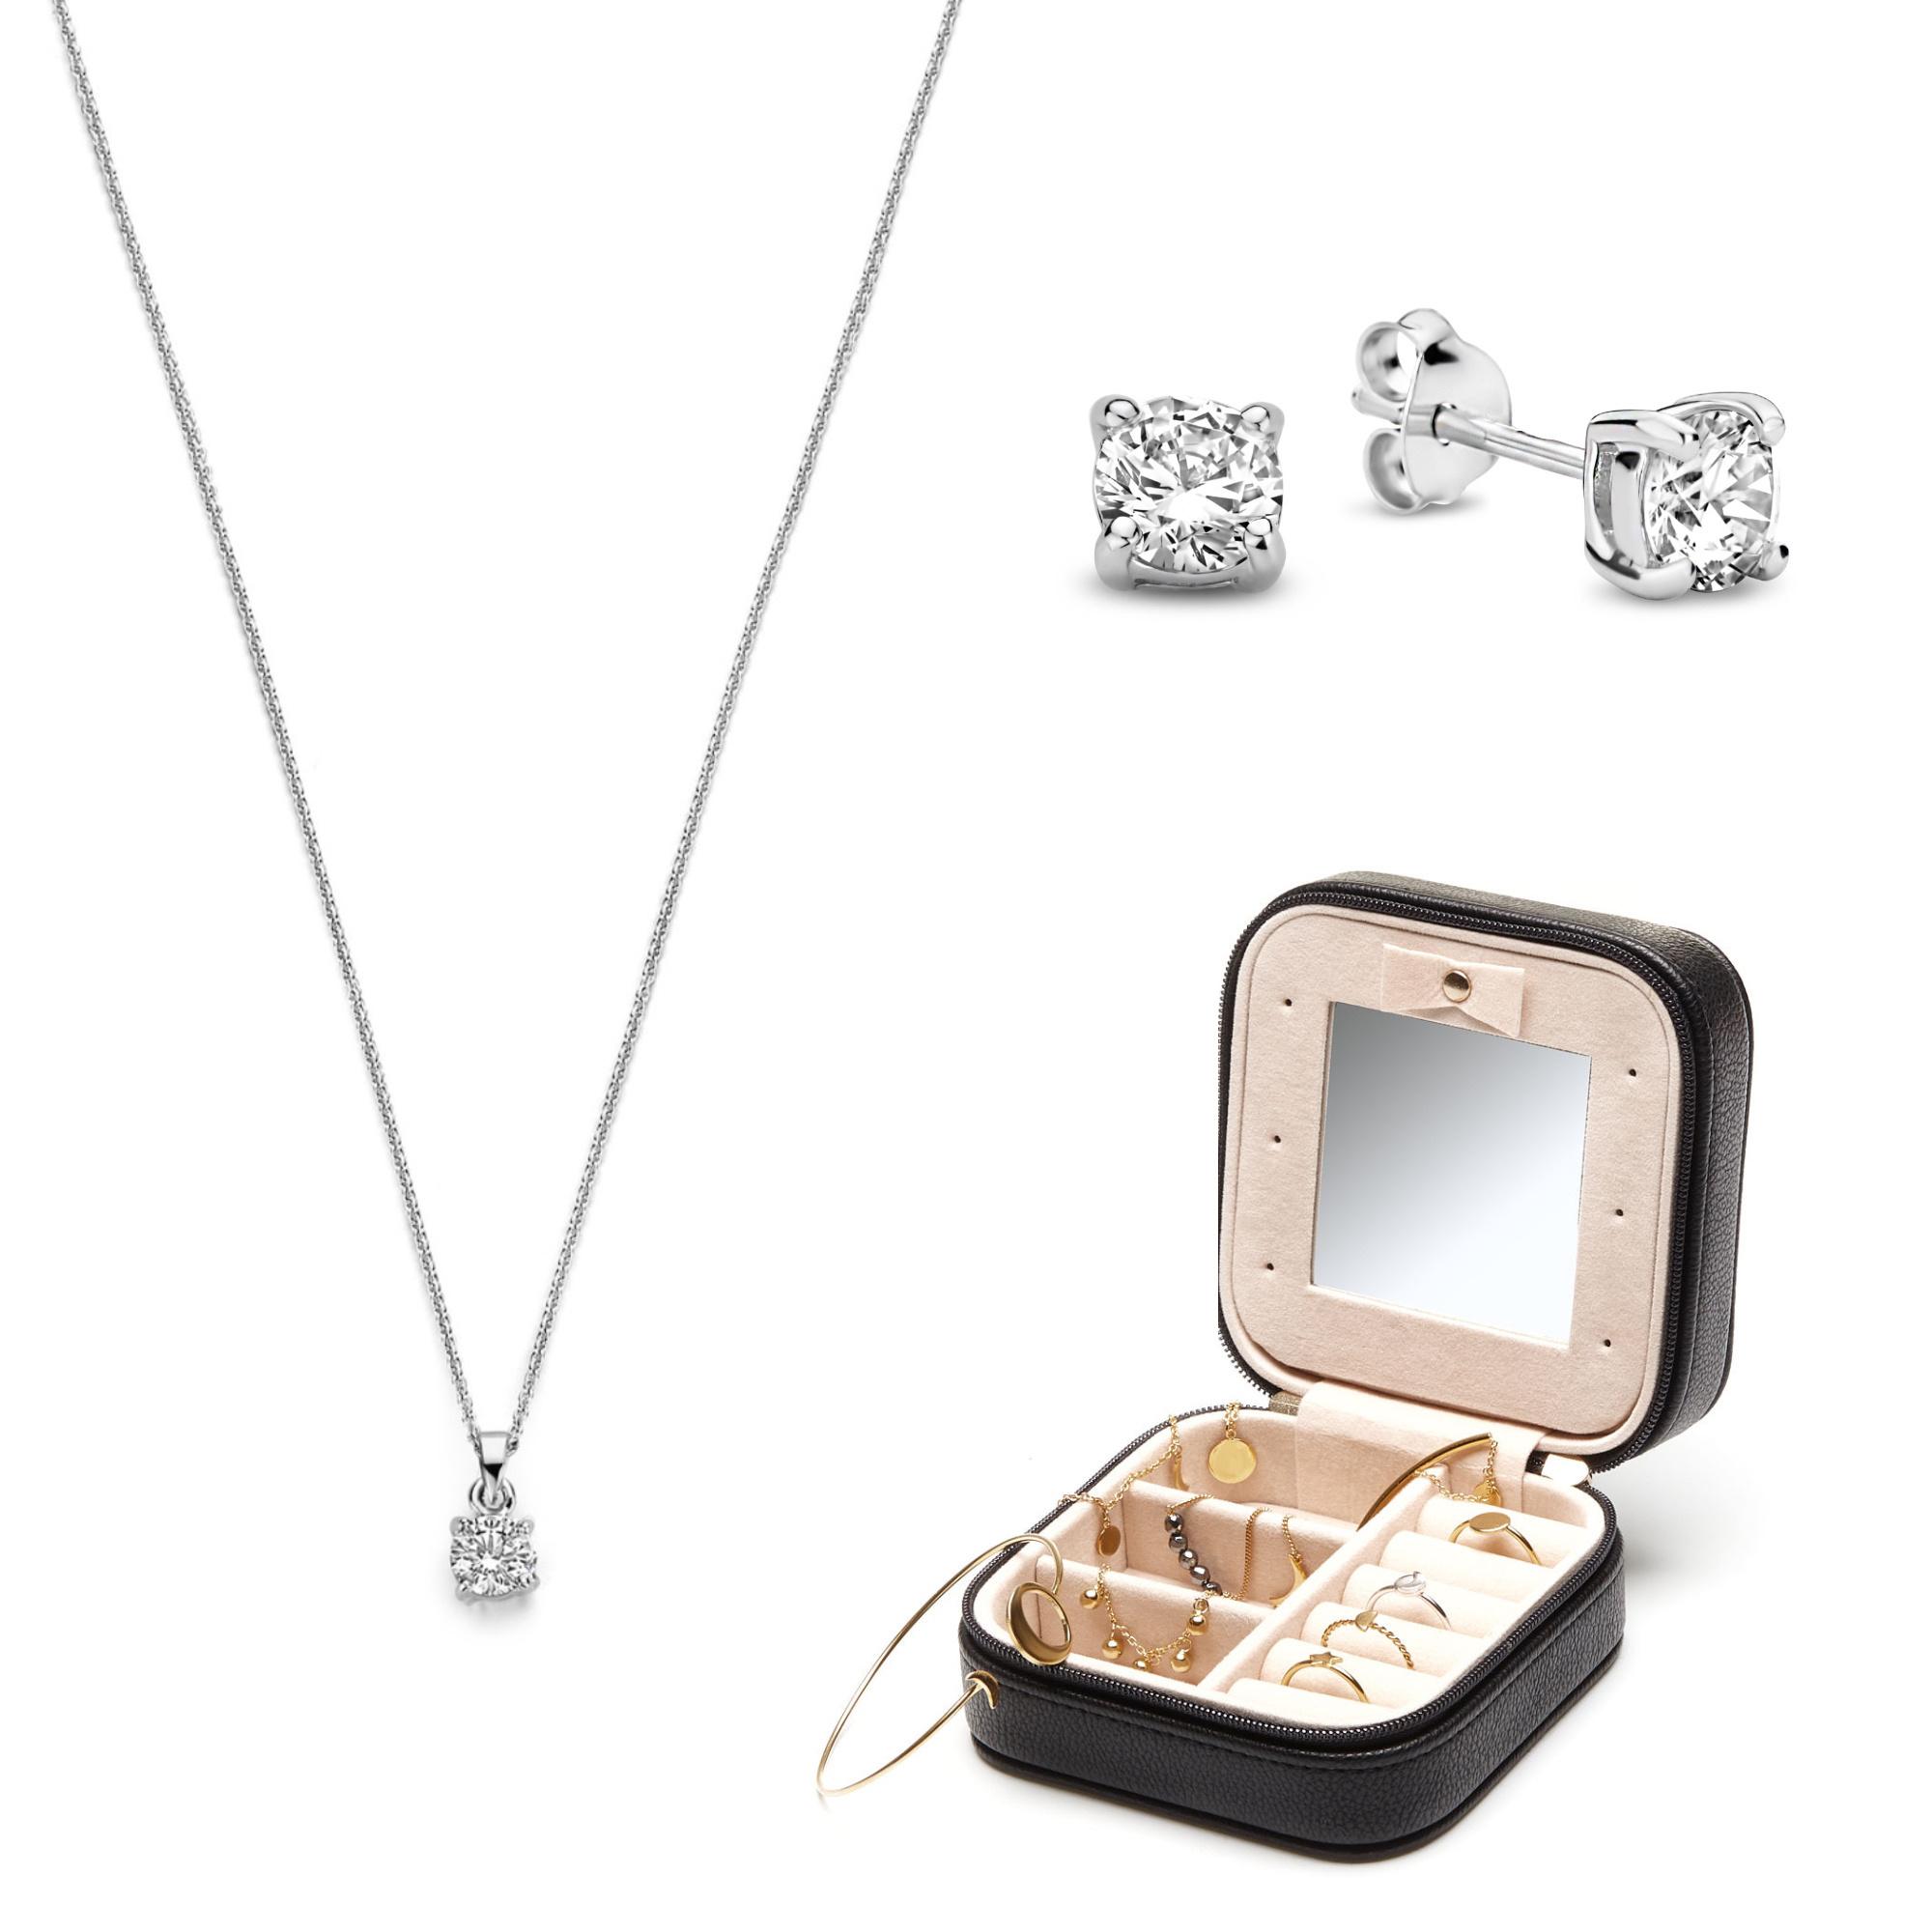 Parte di Me Sorprendimi 925 sterling silver set ear studs, necklace and jewellery box